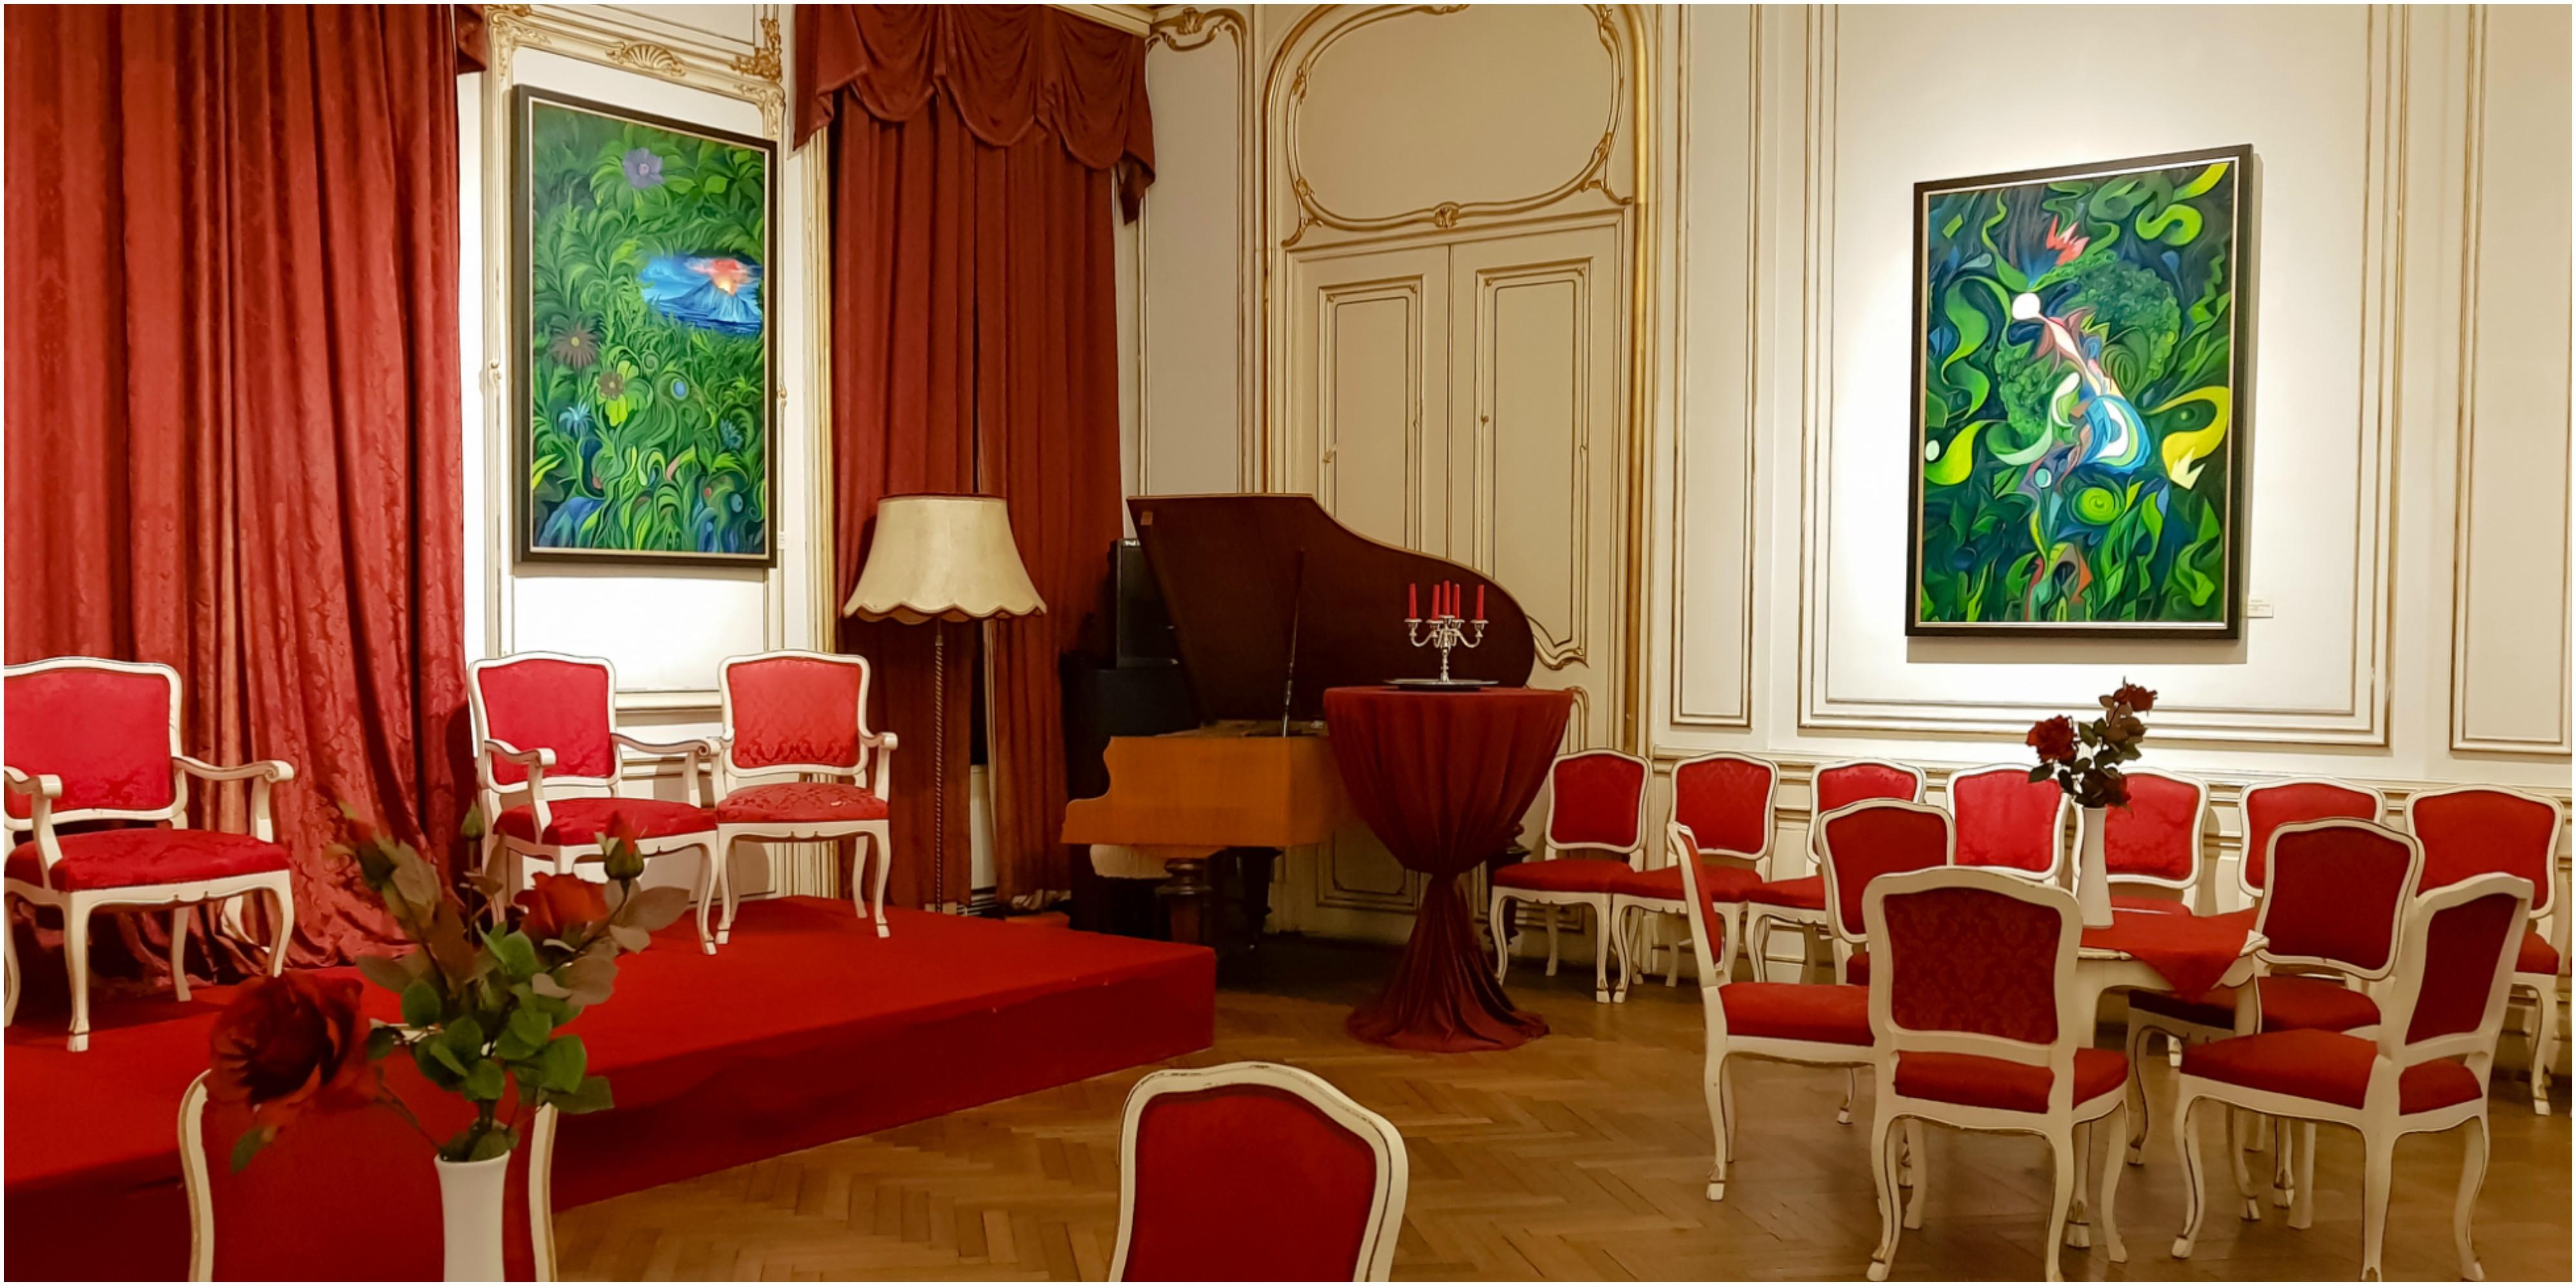 palais-palfy-musique-opéra-mozart-vienne